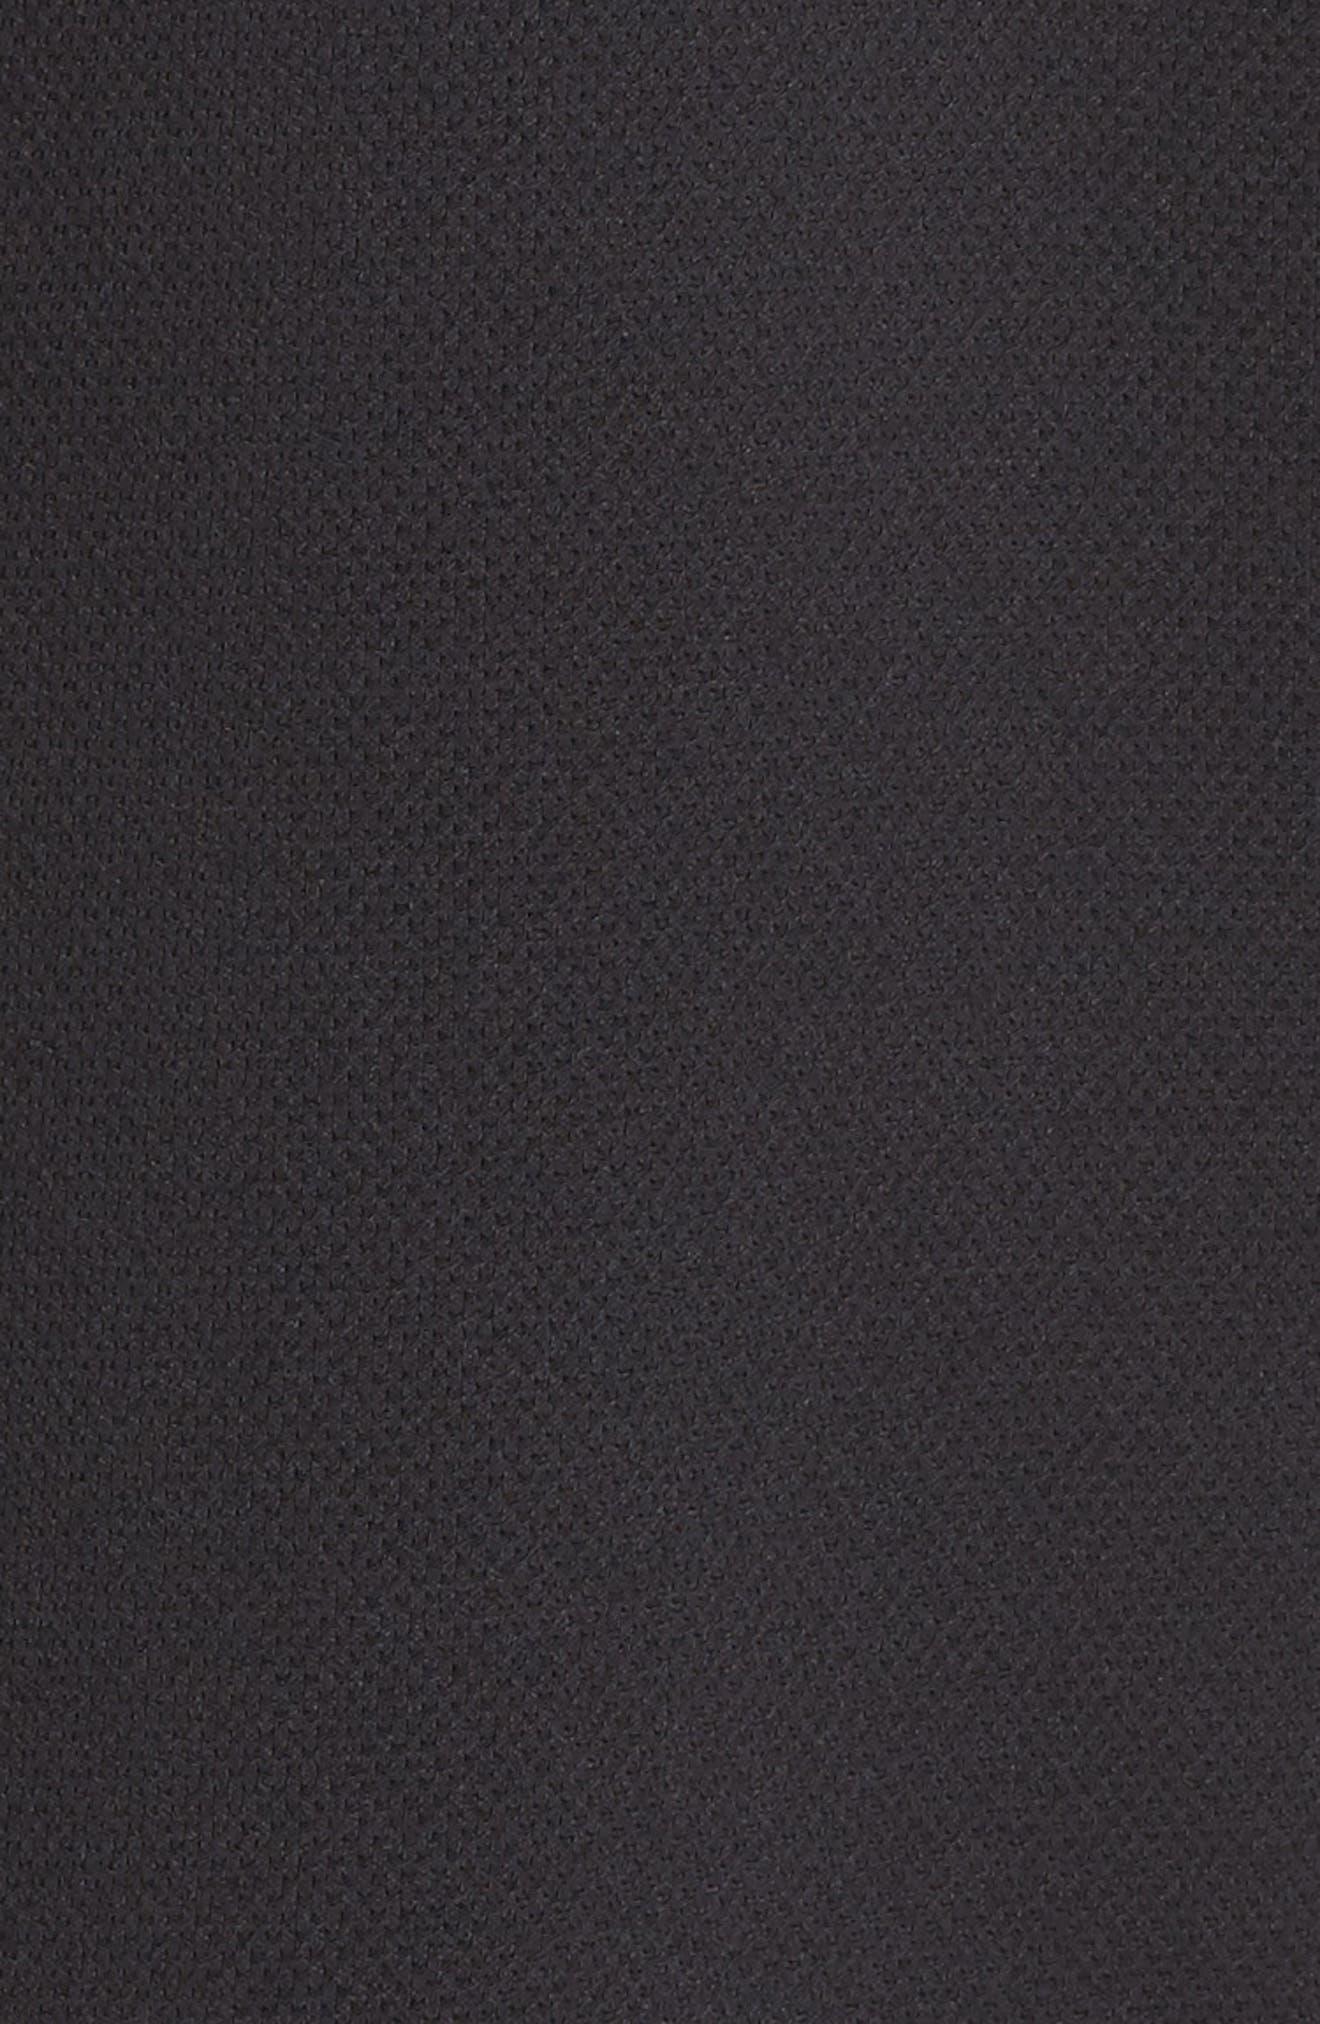 ZELLA, Arise Luxe Bomber Jacket, Alternate thumbnail 7, color, BLACK